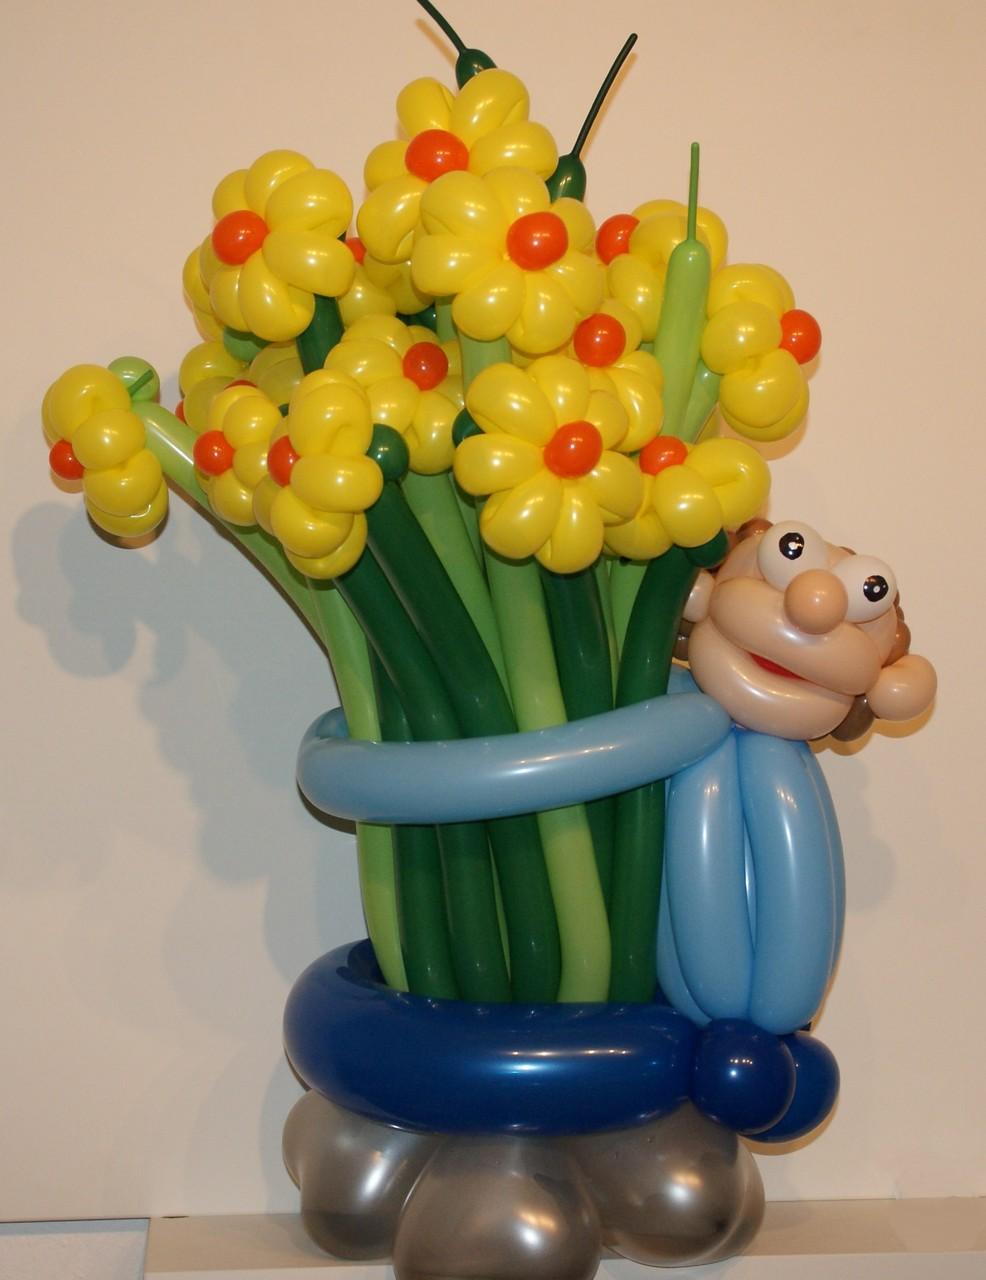 Ballonblumen twisten, Geburtstag , Blumenstrauß ,Mr. toni balloni ch